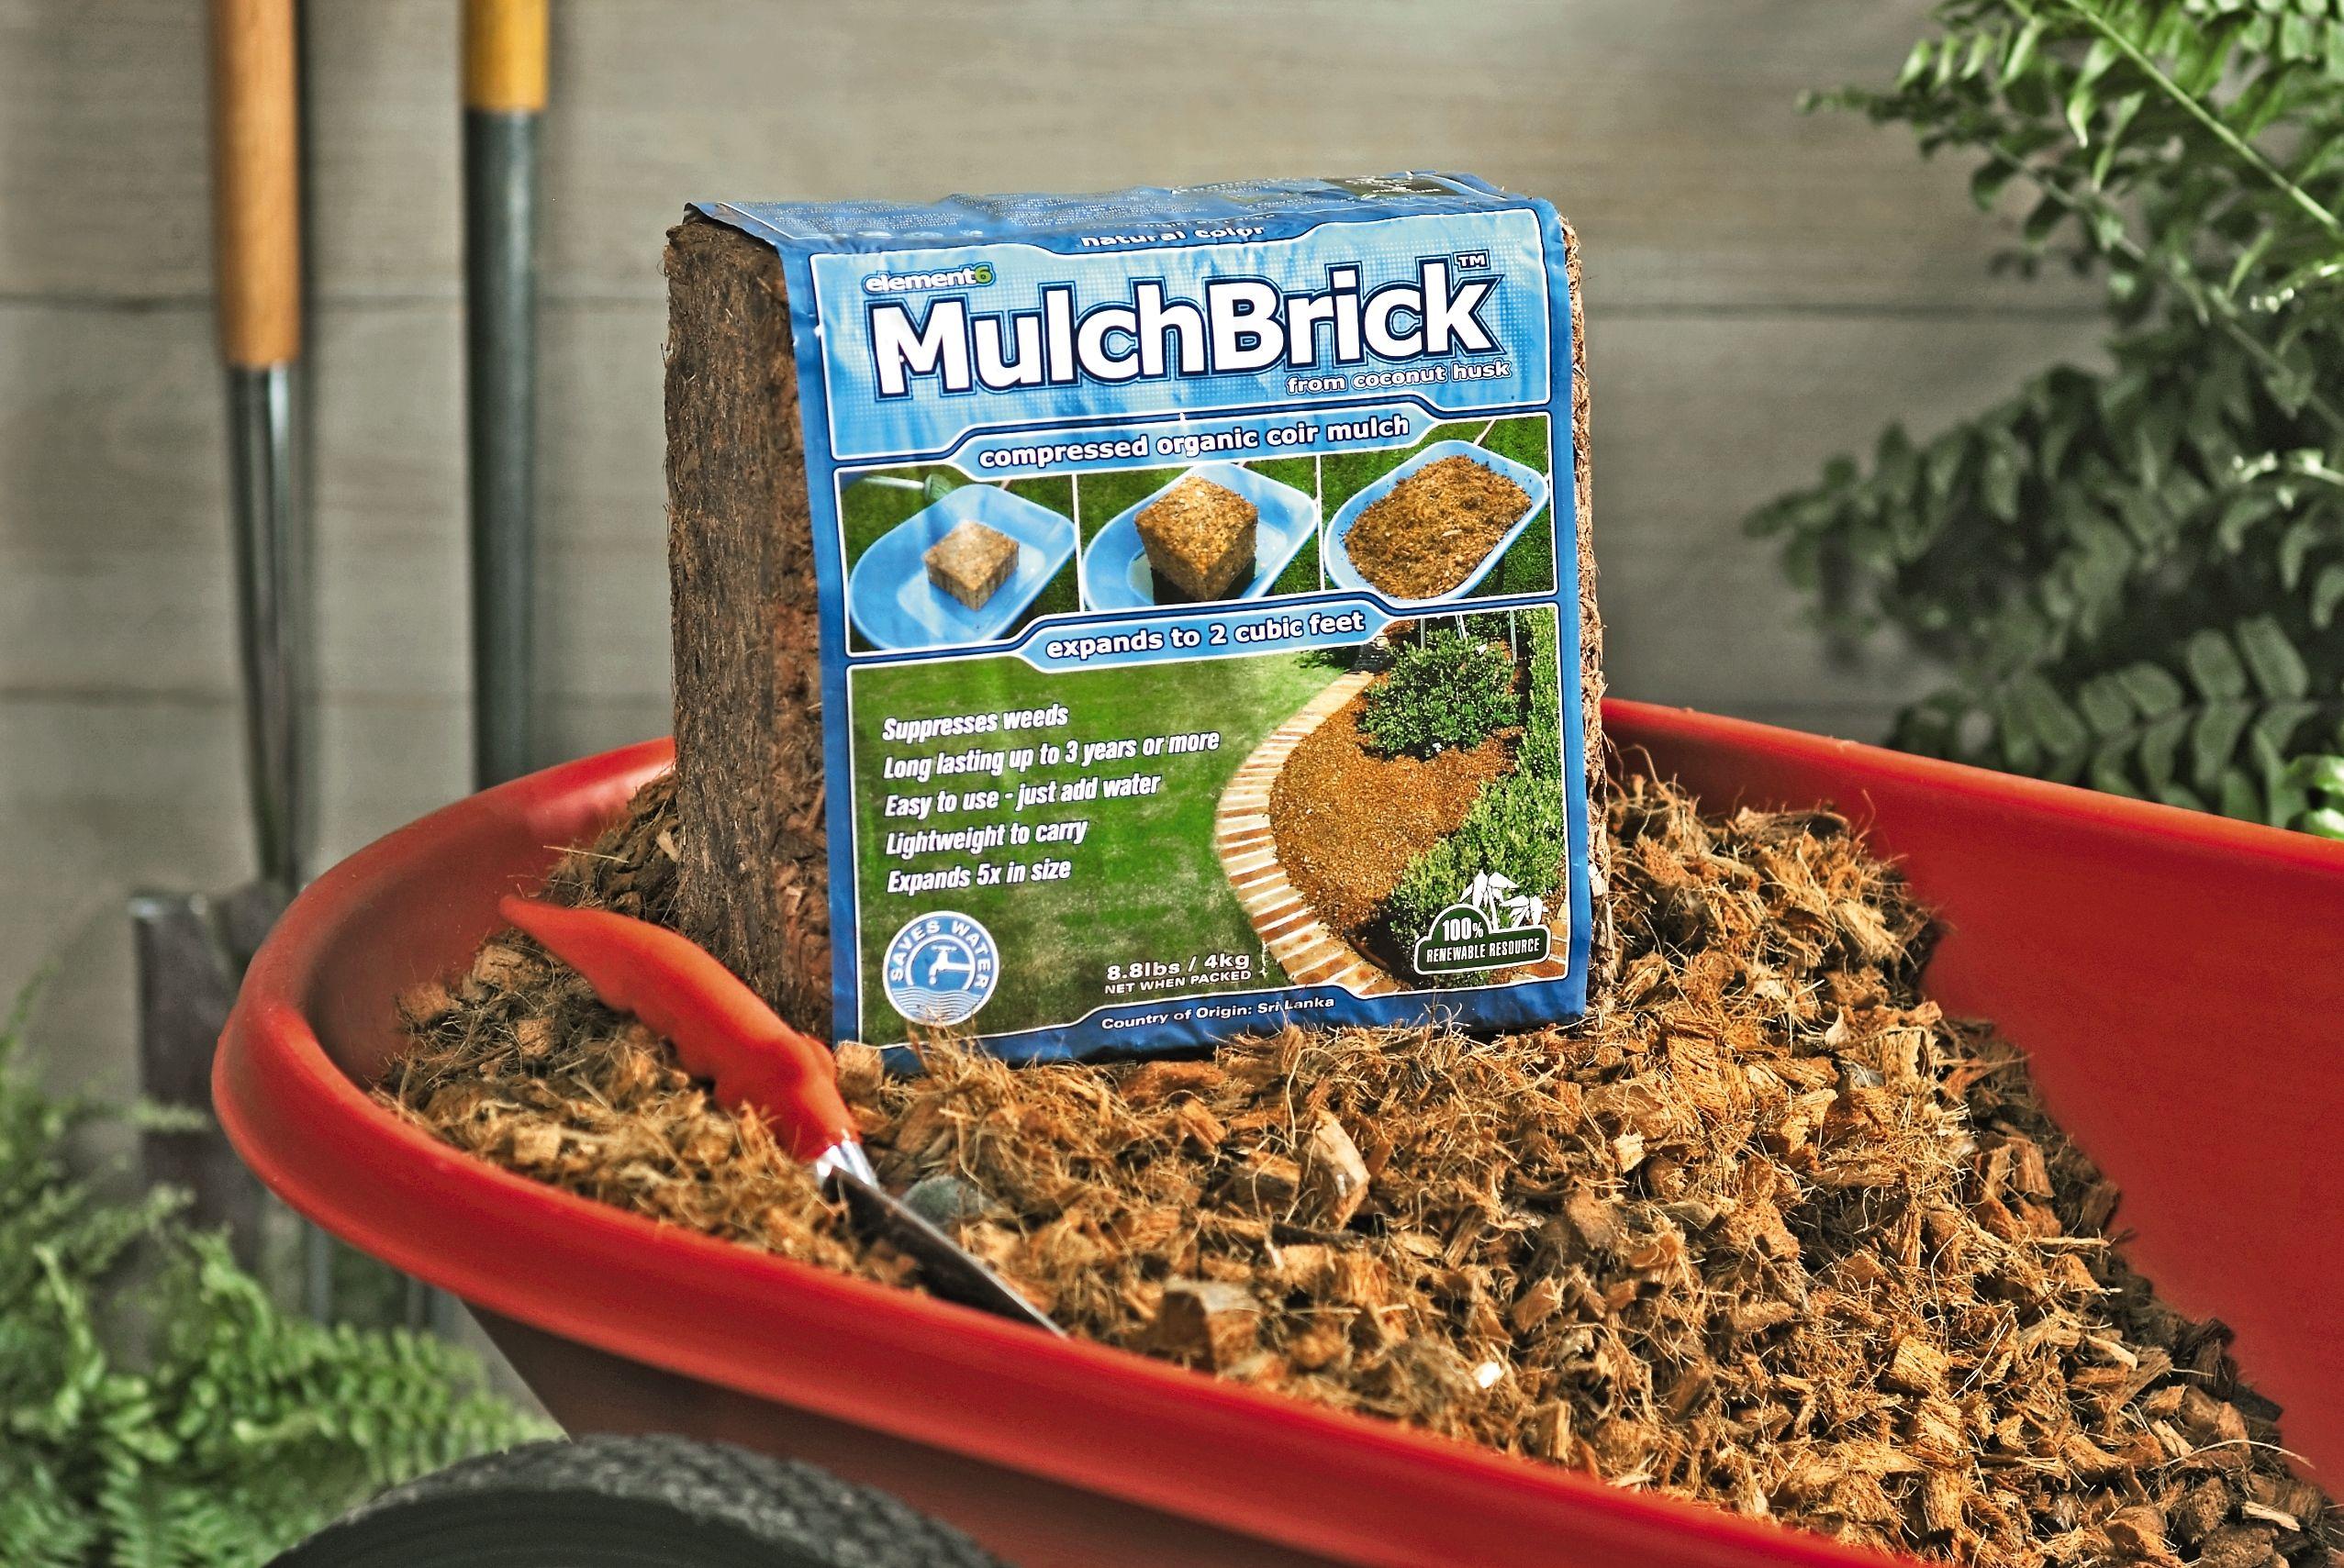 Coconut Mulch - Coir Mulch - Coconut Husk Mulch - MulchBrick